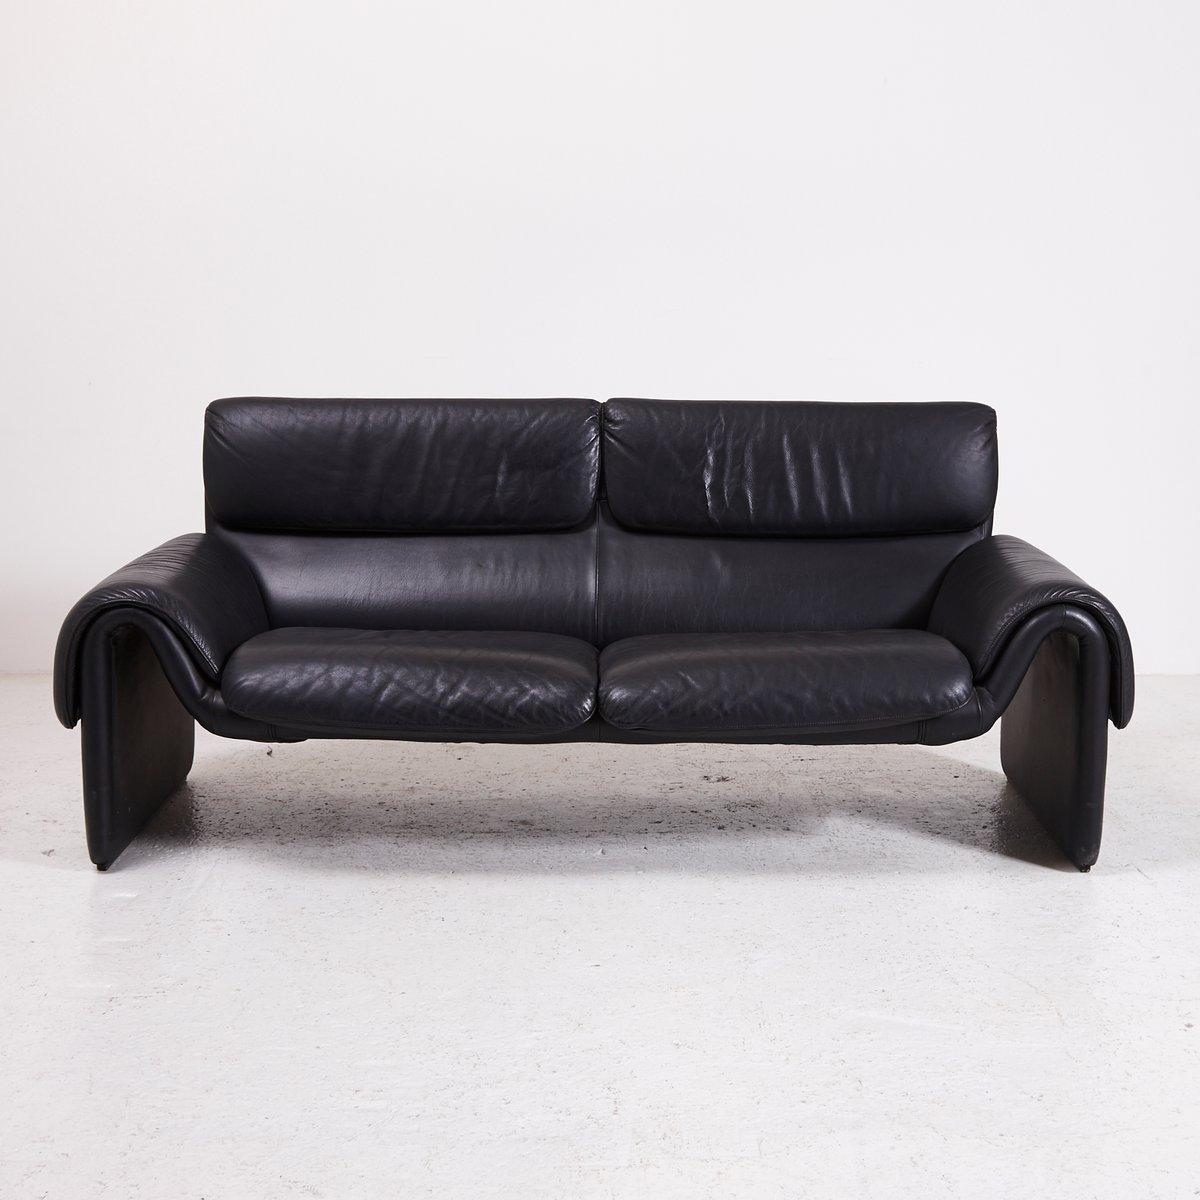 Modell DS2011 2-Sitzer Sofa von de Sede